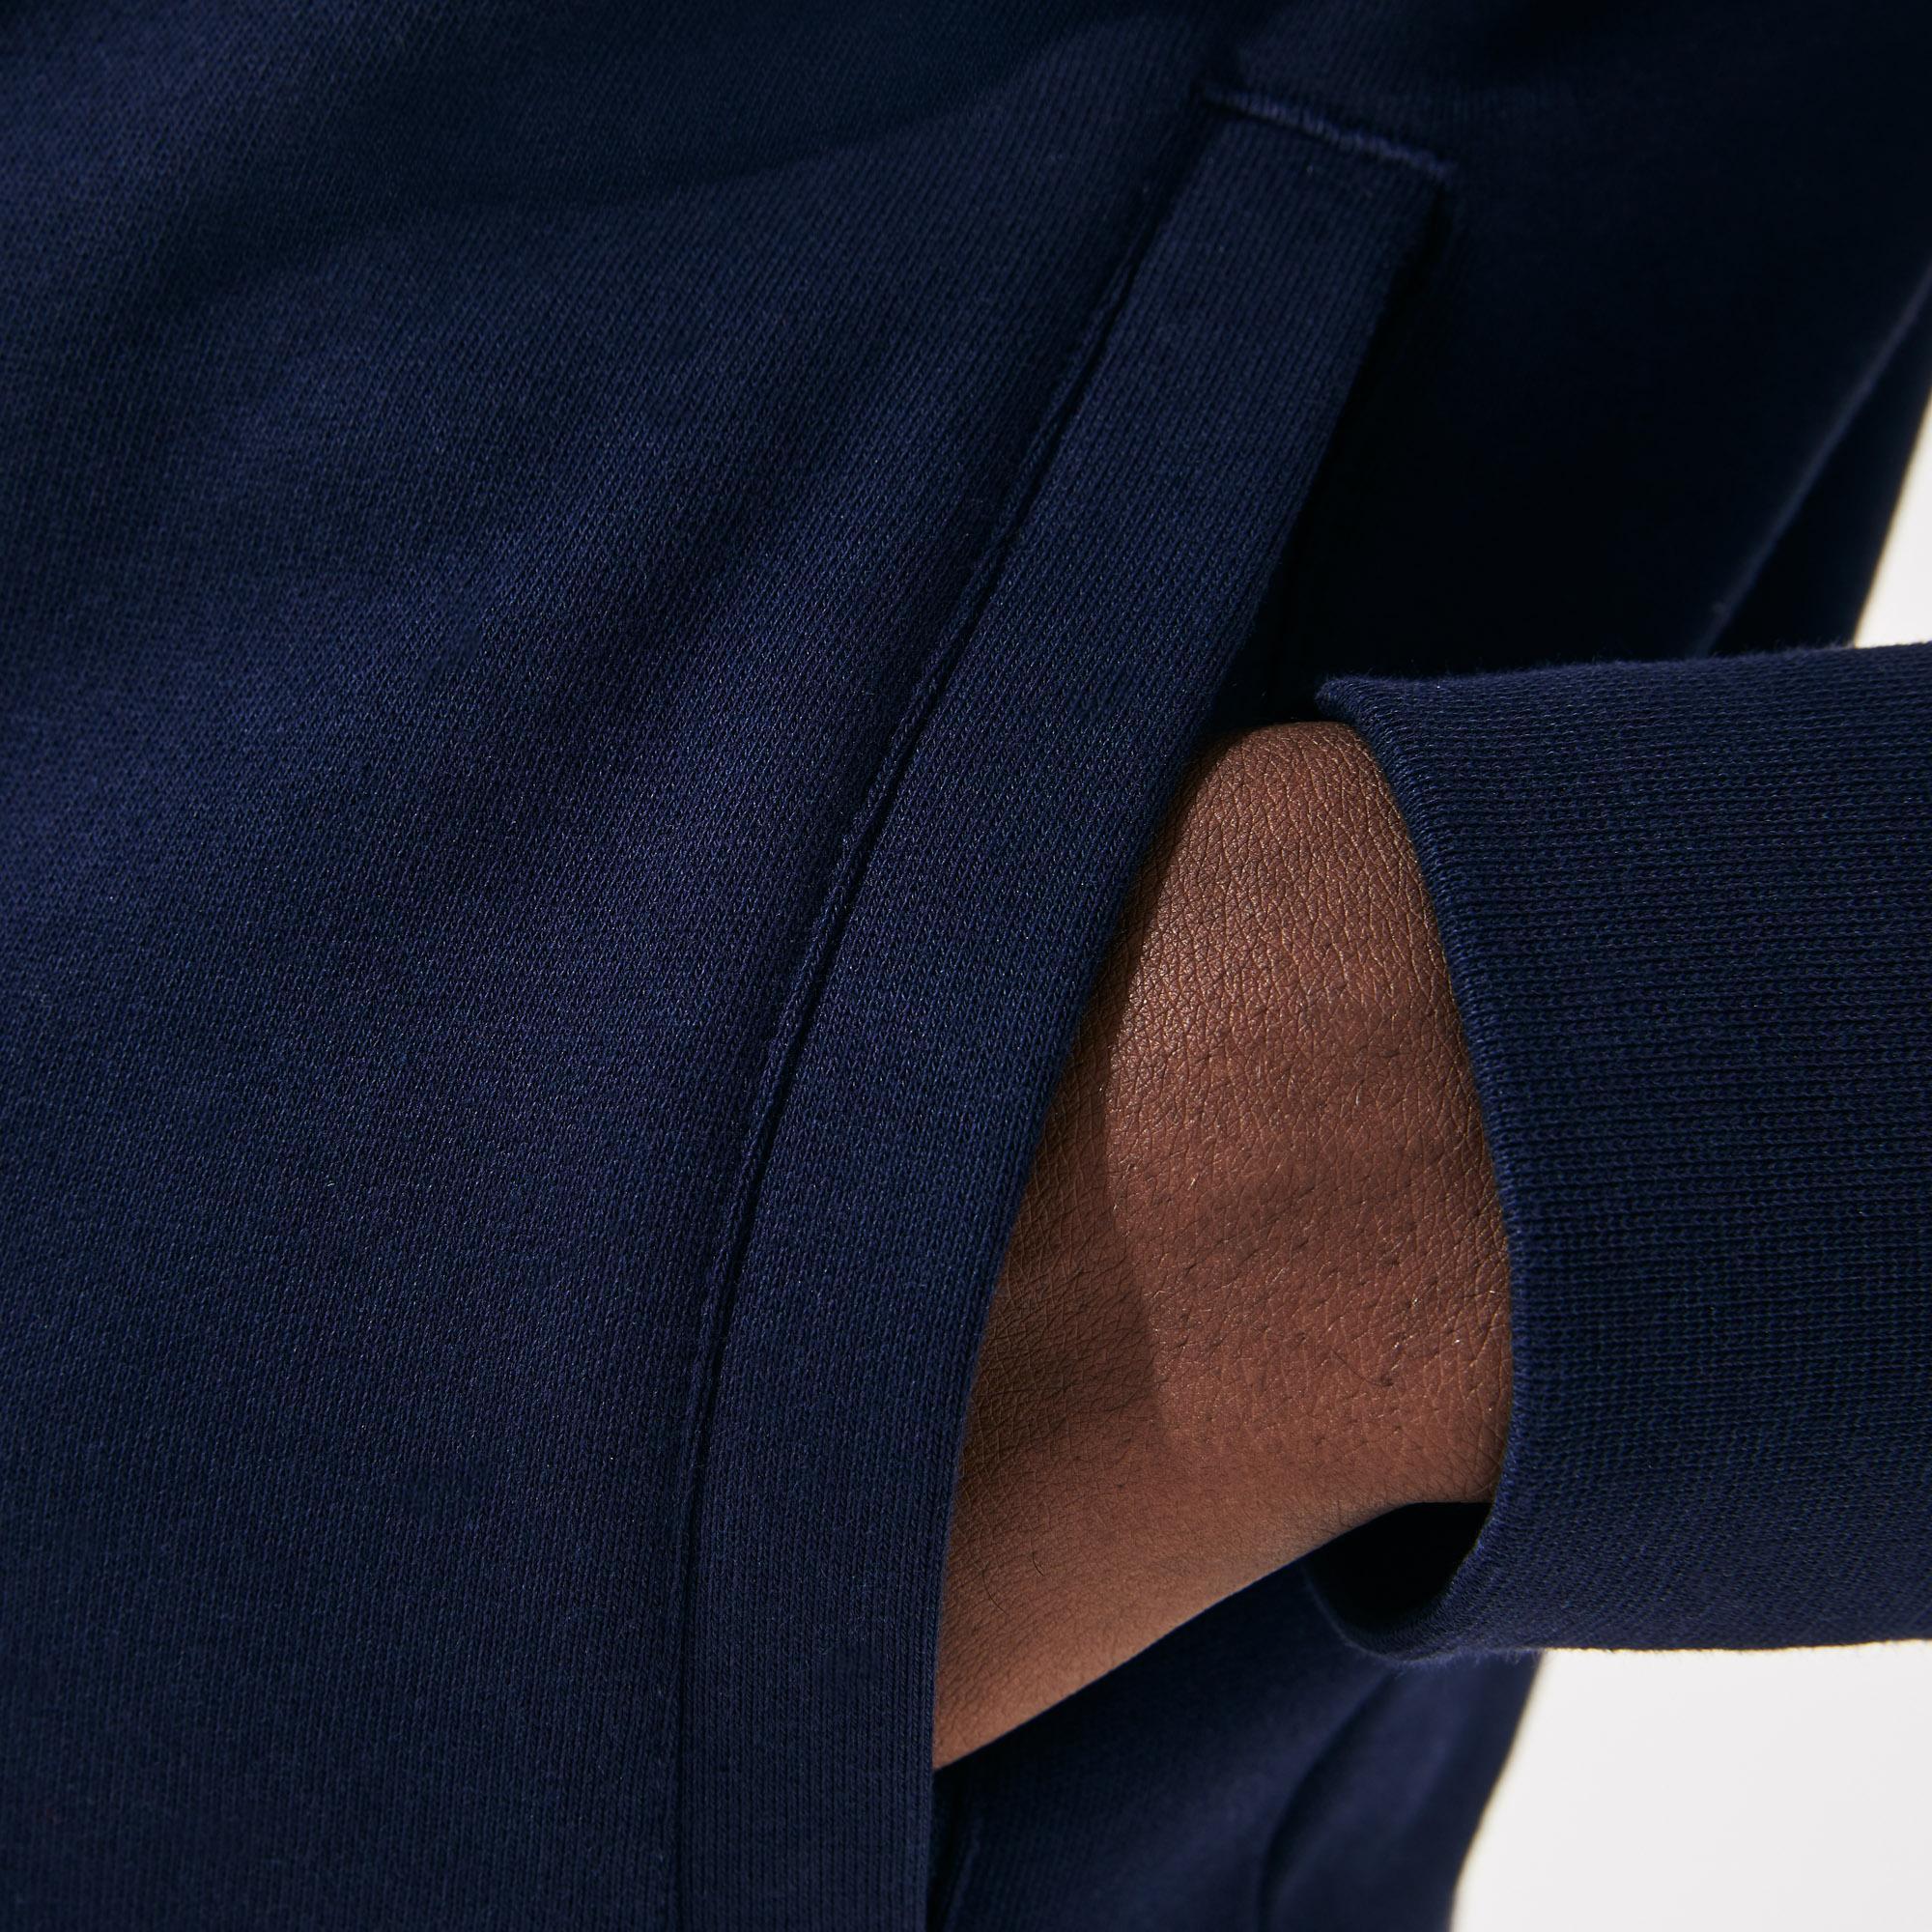 Lacoste Men's Sport Tennis Hooded Zippered Sweatshirt İn Fleece